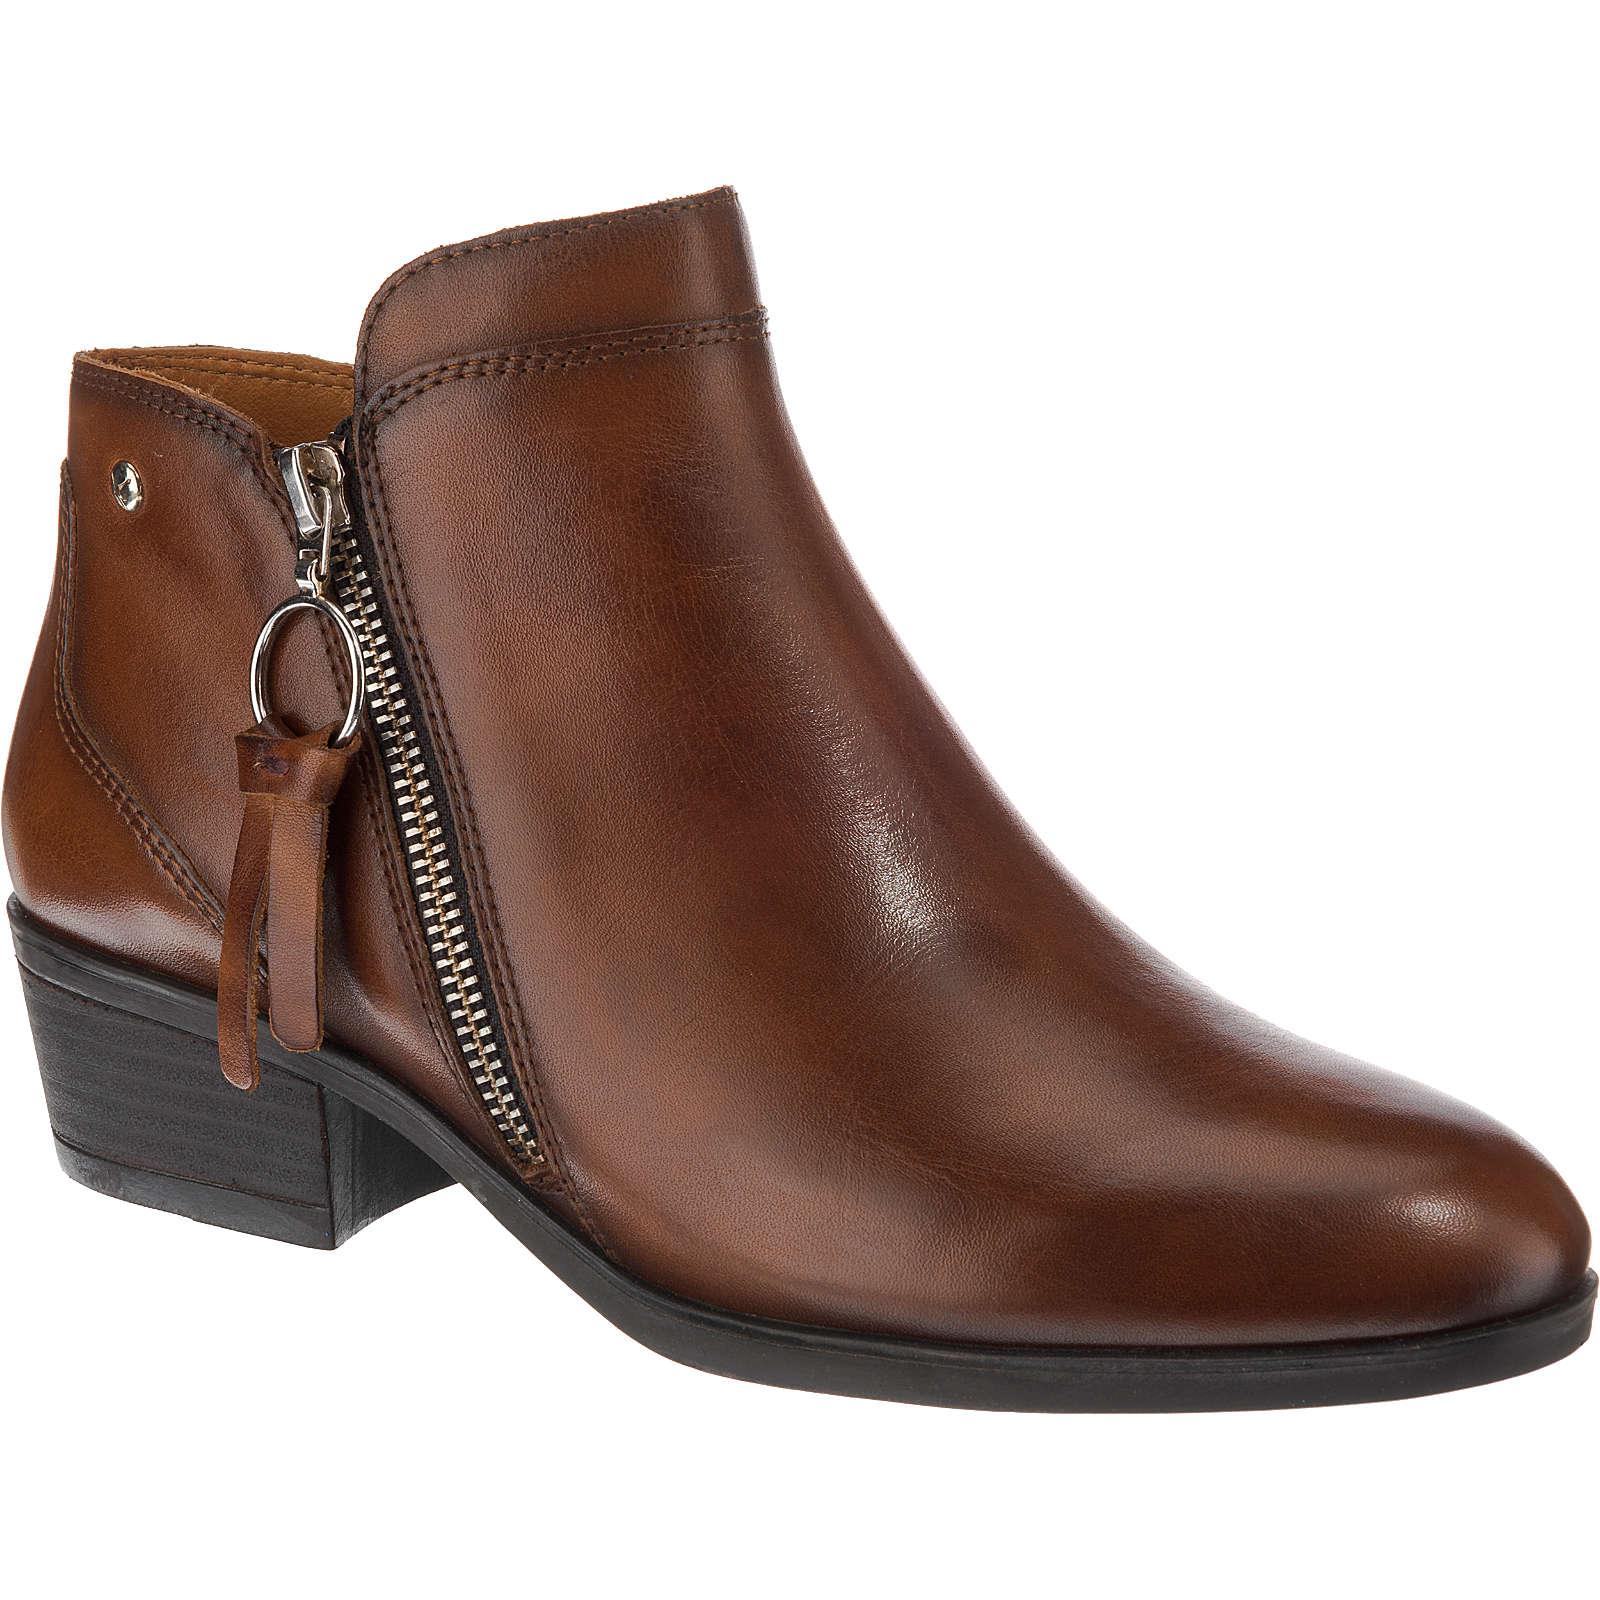 Pikolinos DARO Ankle Boots dunkelbraun Damen Gr. 37